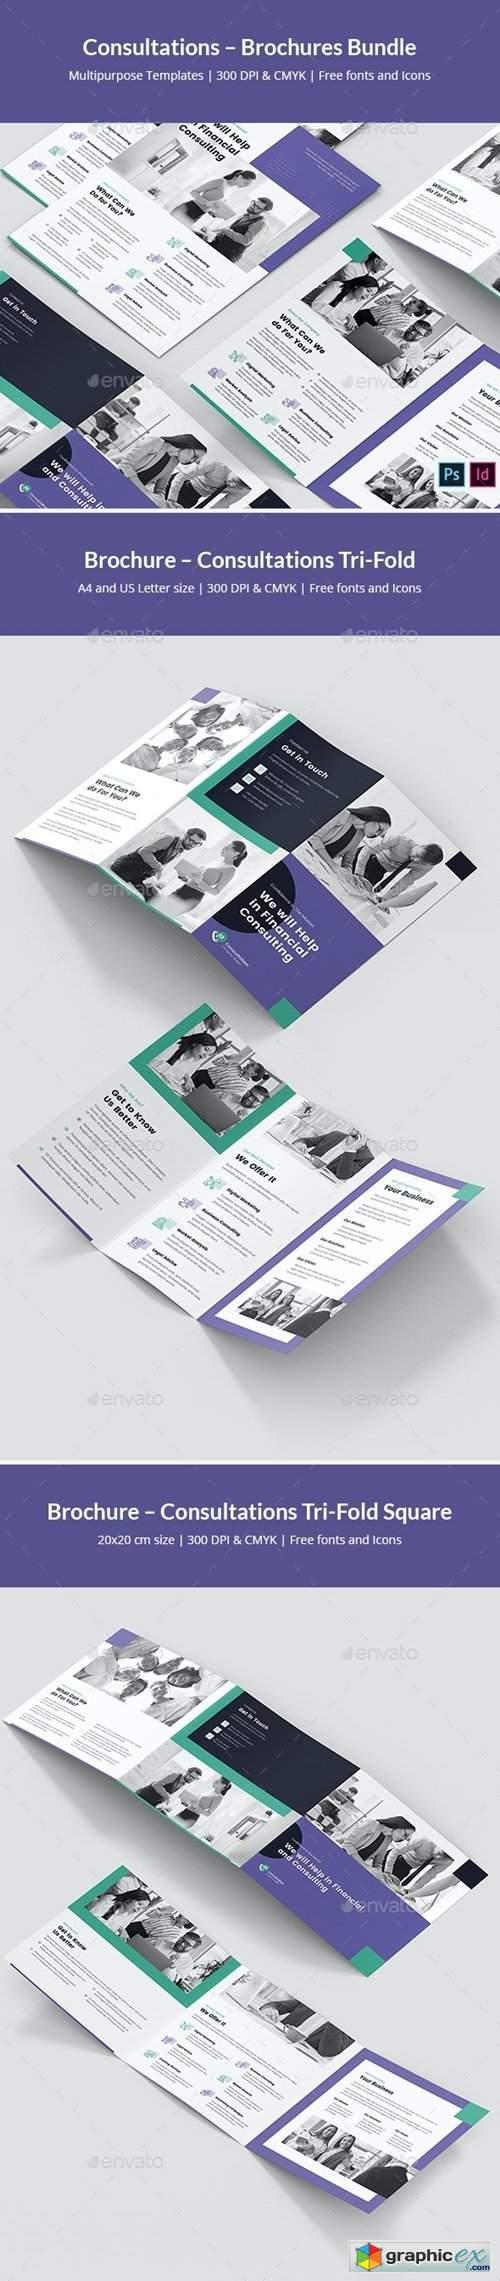 Consultations – Brochures Bundle Print Templates